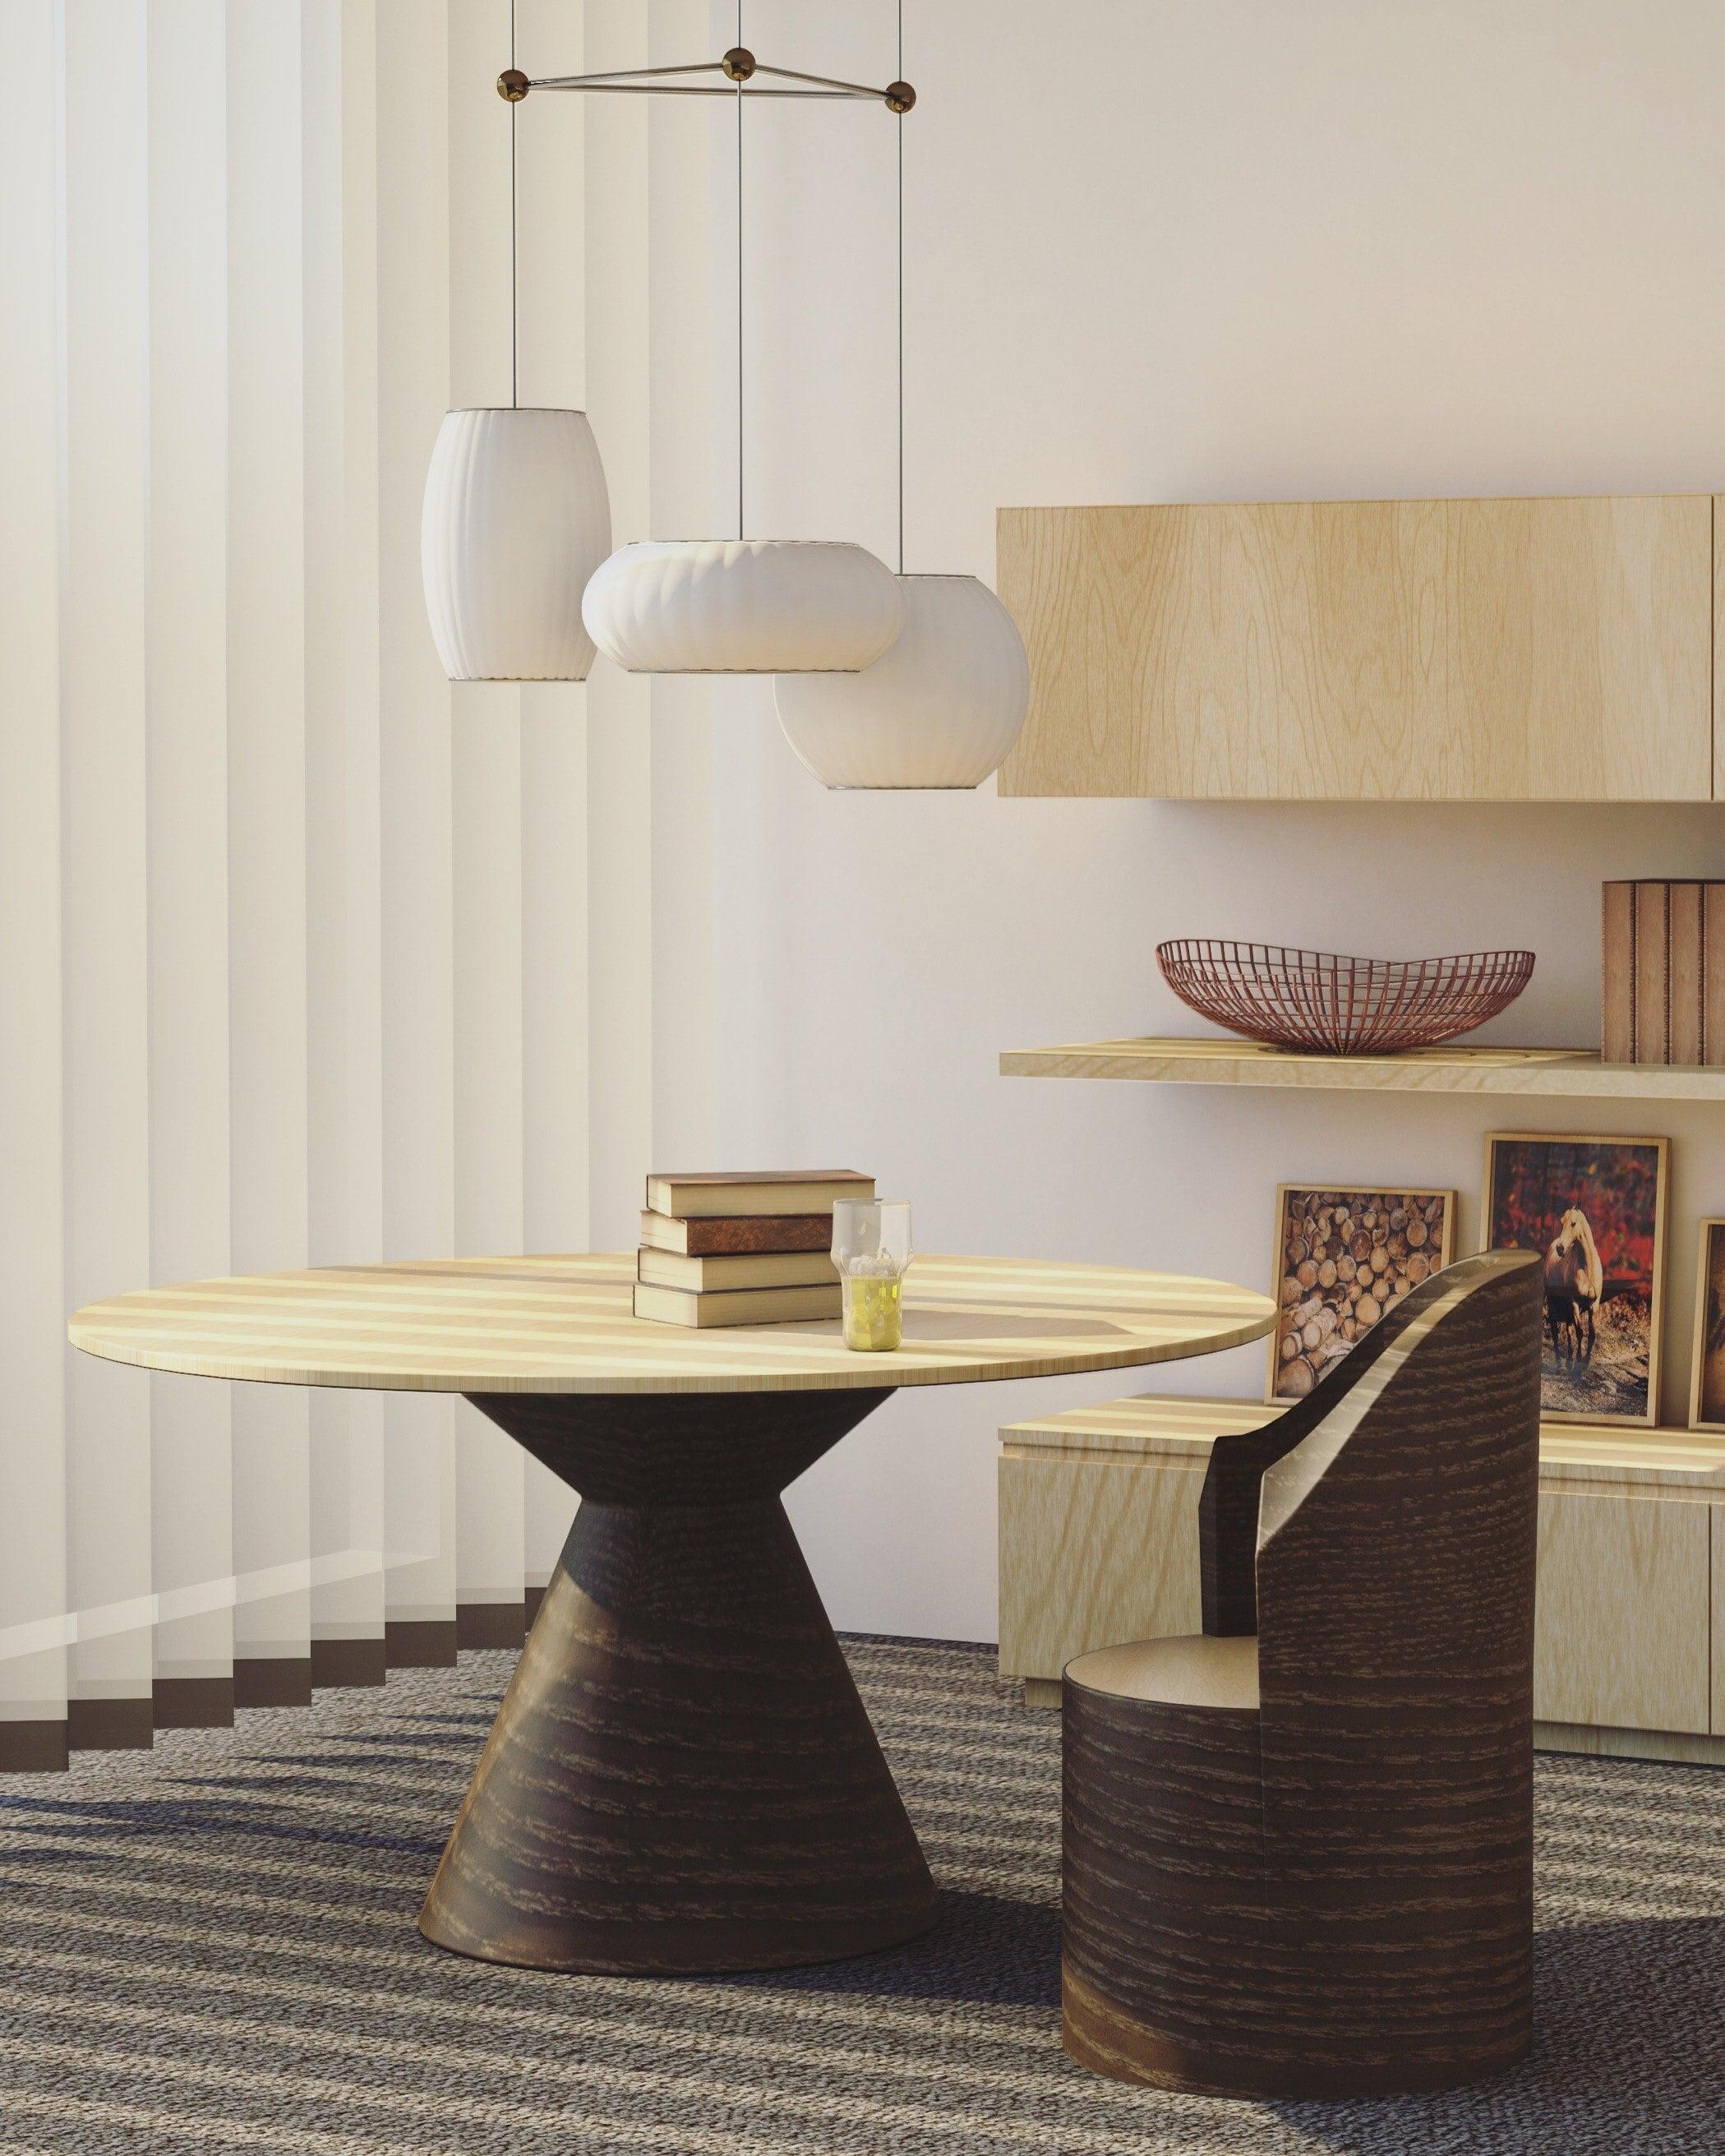 apartment-architecture-artist-447592-min.jpg